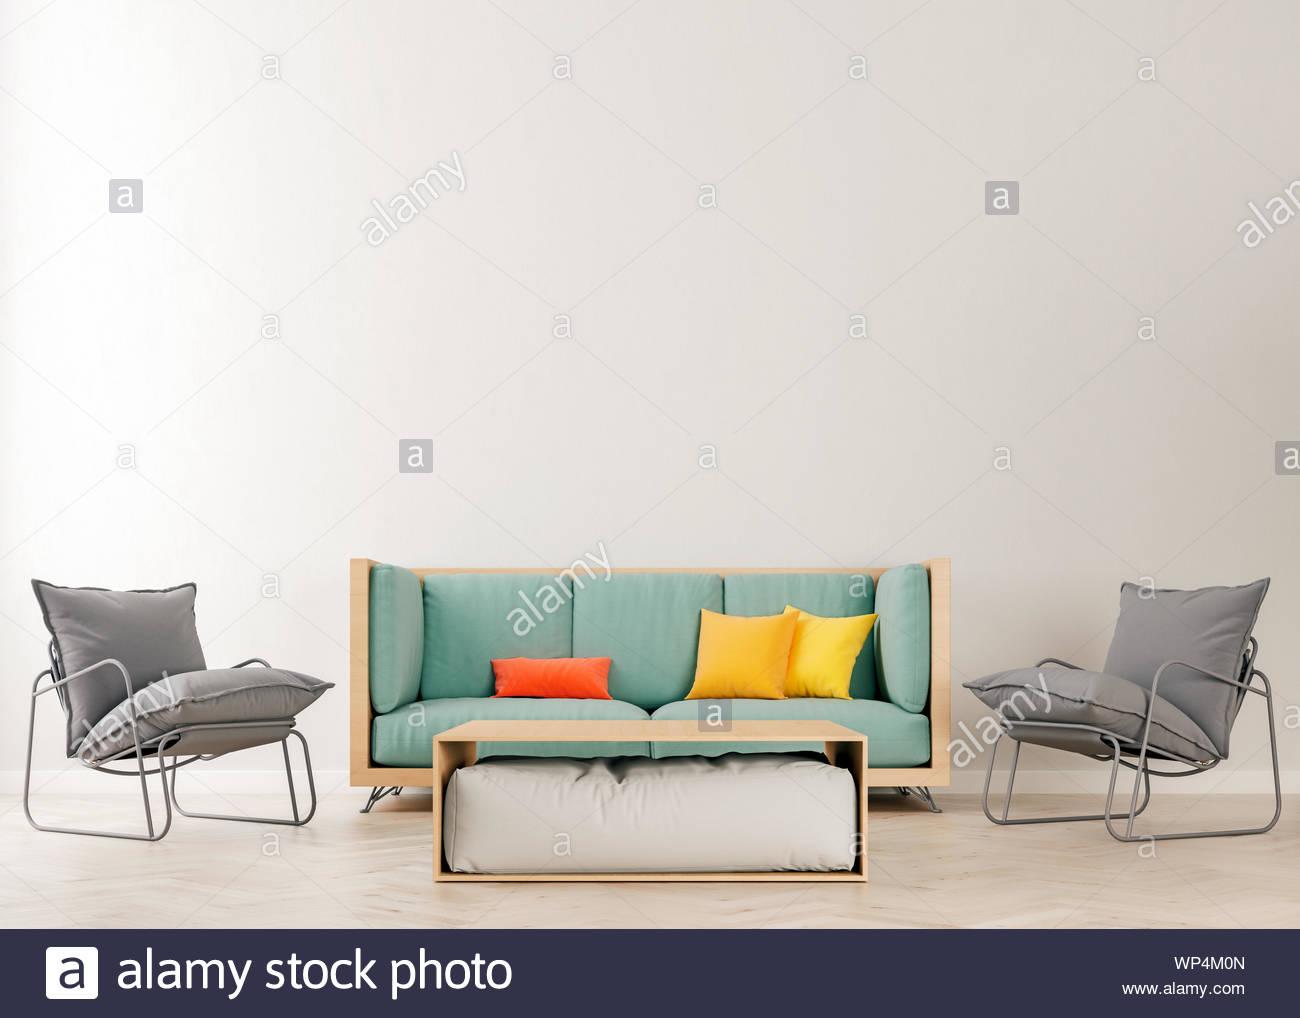 Marvelous Horizontal Mock Up Poster Frame In Modern Interior Inzonedesignstudio Interior Chair Design Inzonedesignstudiocom